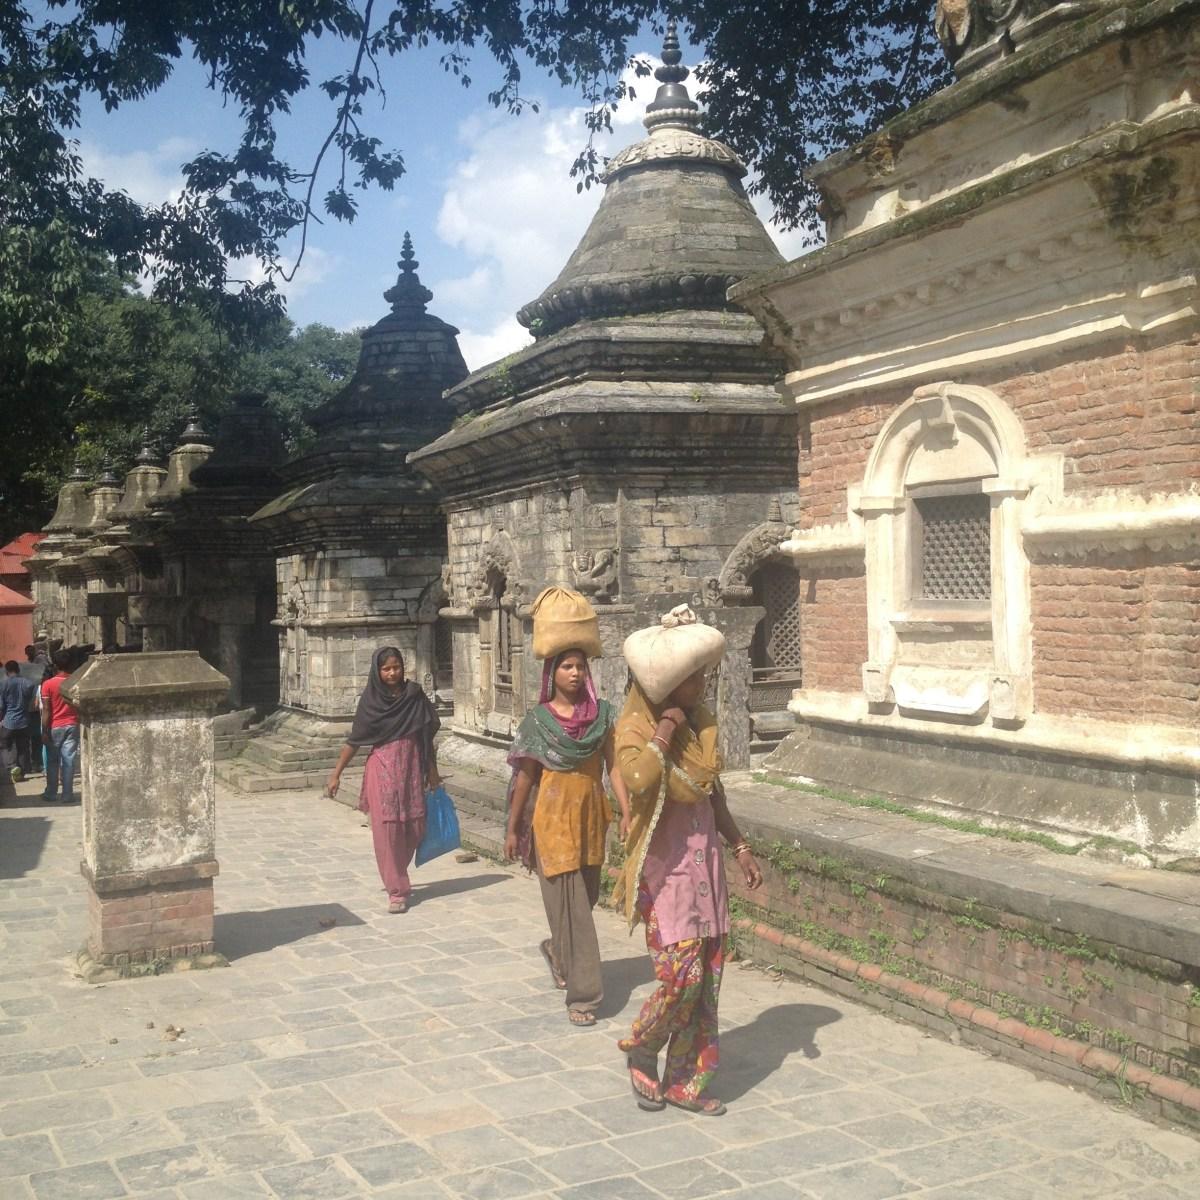 Kathmandu Tourism: John Buys Water at Pashupatinath